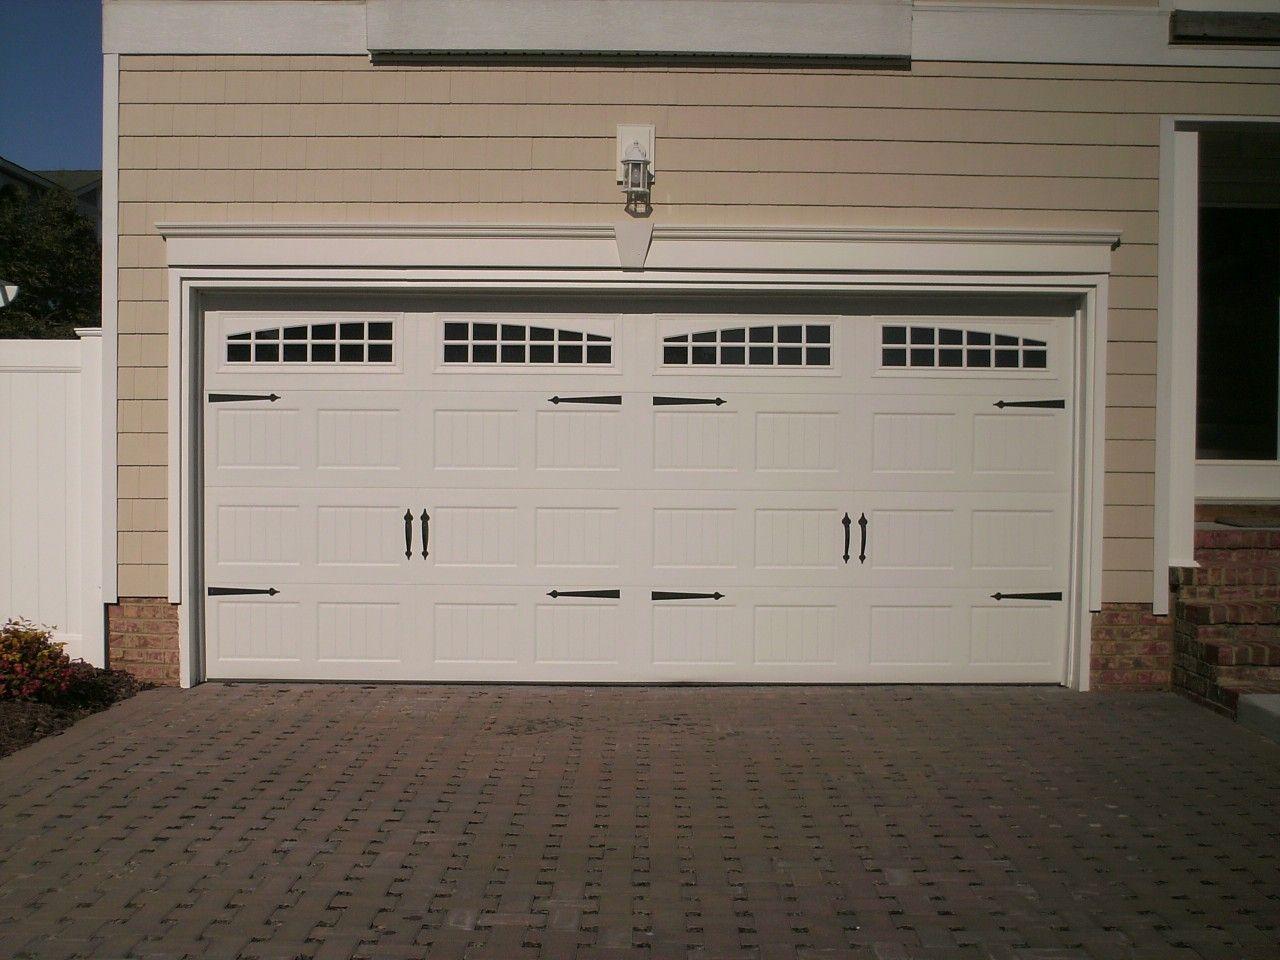 Garage Door Designs Ideas.Ideas Bright White Double Carriage Garage Doors On Brown